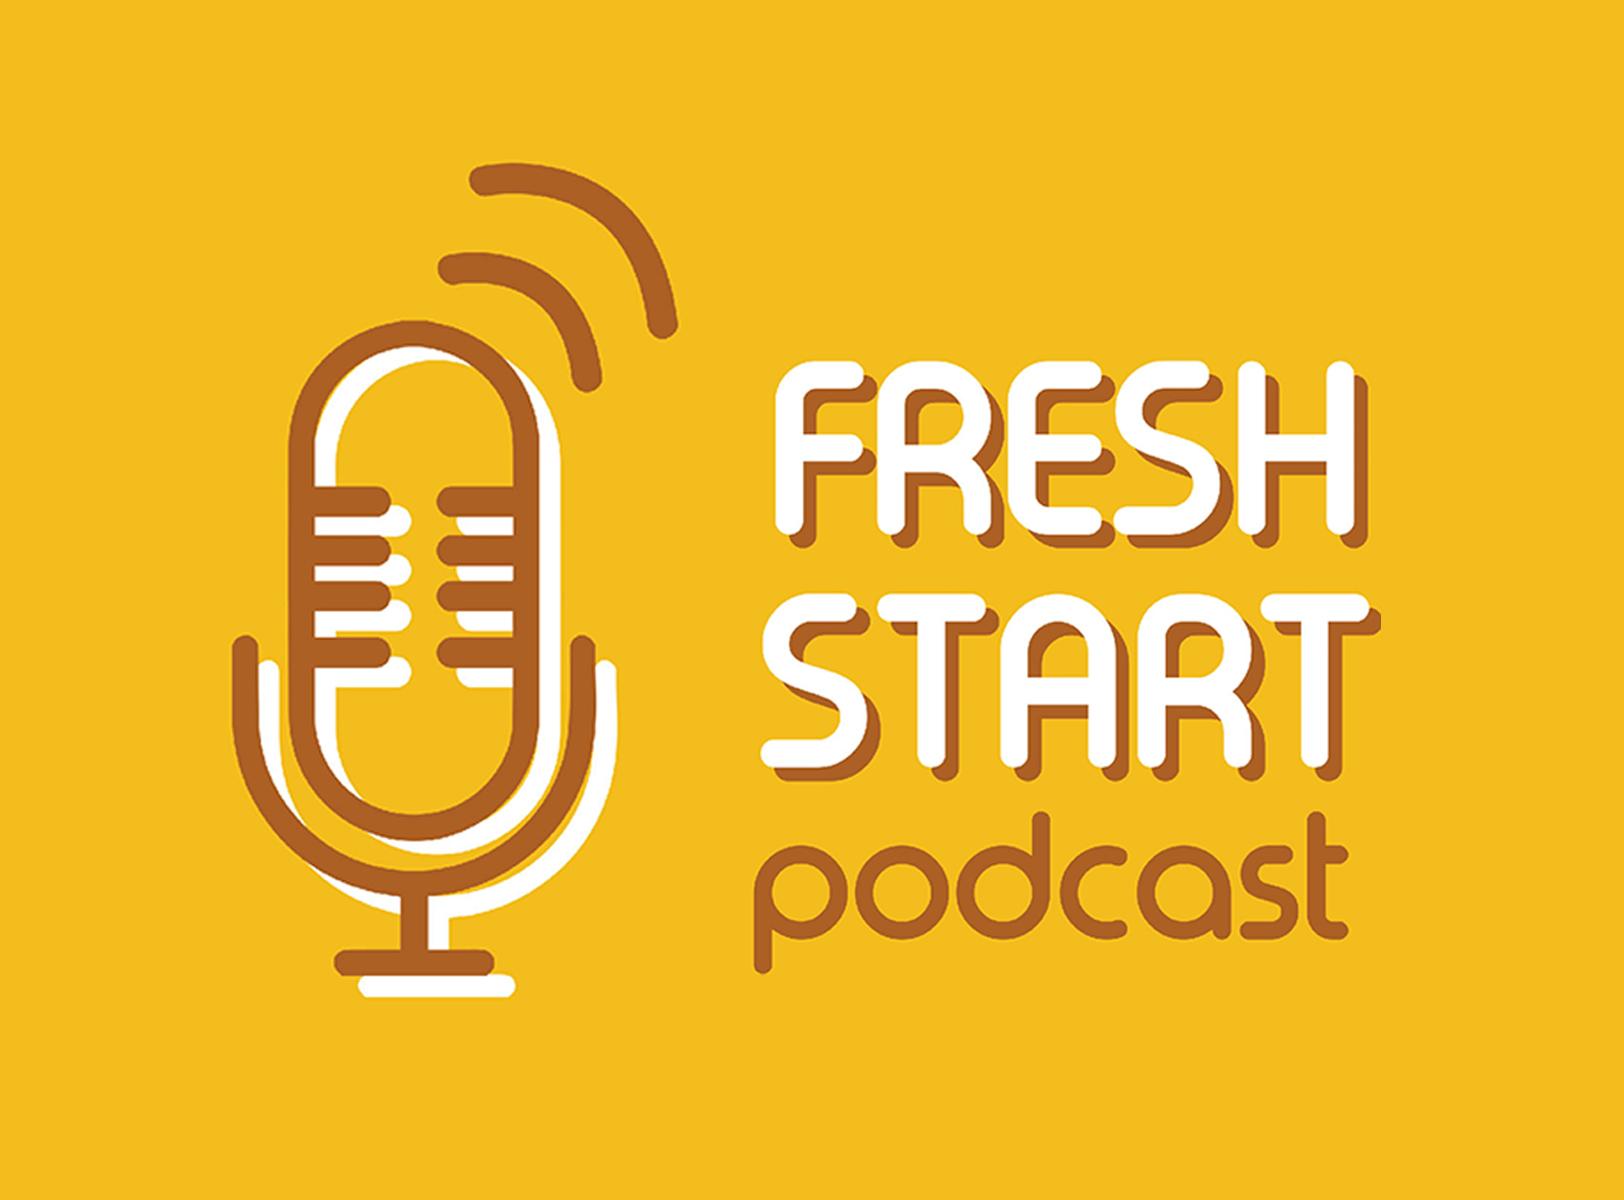 Fresh Start: Podcast News (7/22/2019 Mon.)